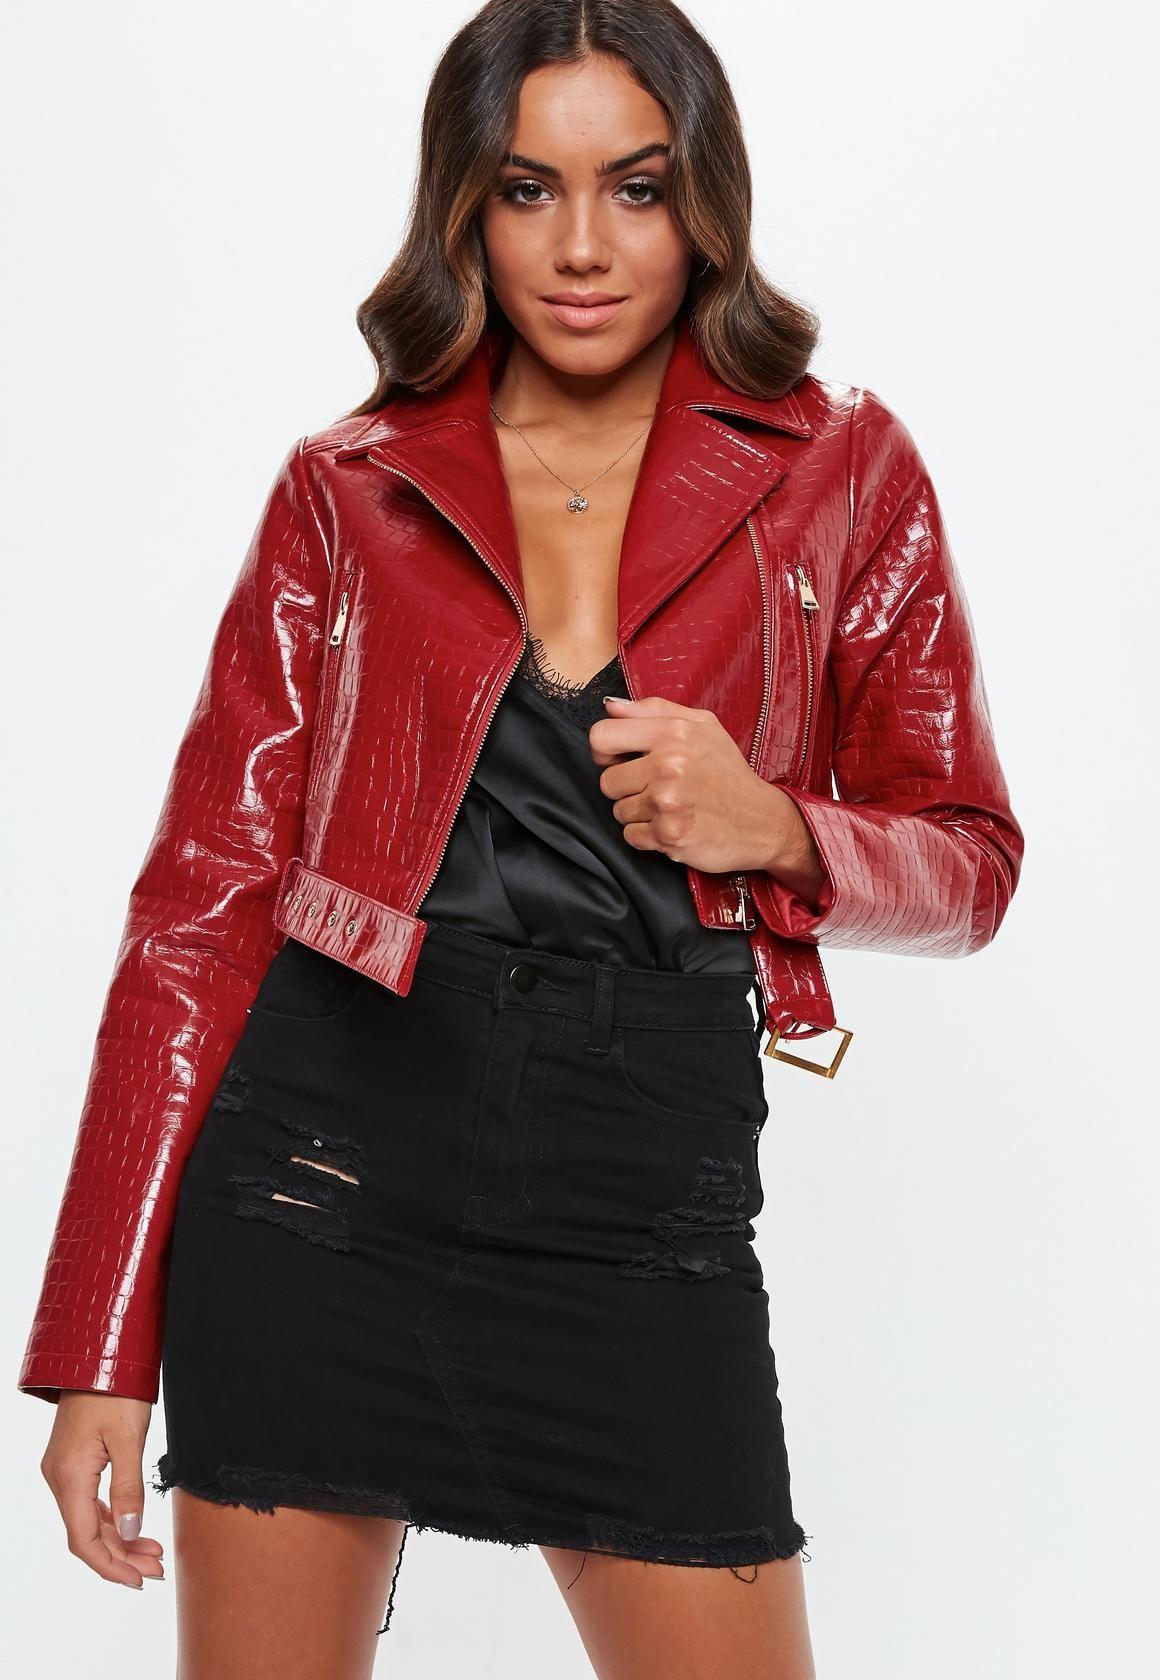 Missguided Red Croc Biker Jacket Coats Jackets Women Coats For Women Jackets [ 1680 x 1160 Pixel ]